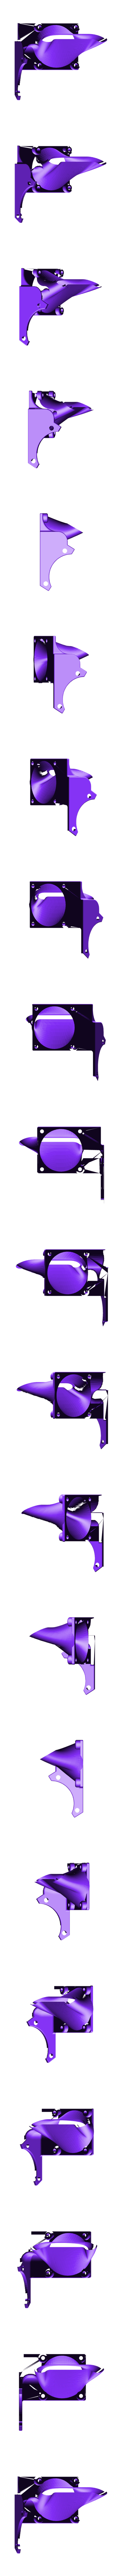 fan_duct_mirror.stl Download free STL file FDM Printer de Kleine Reus 300x300x900 • 3D printable object, Job